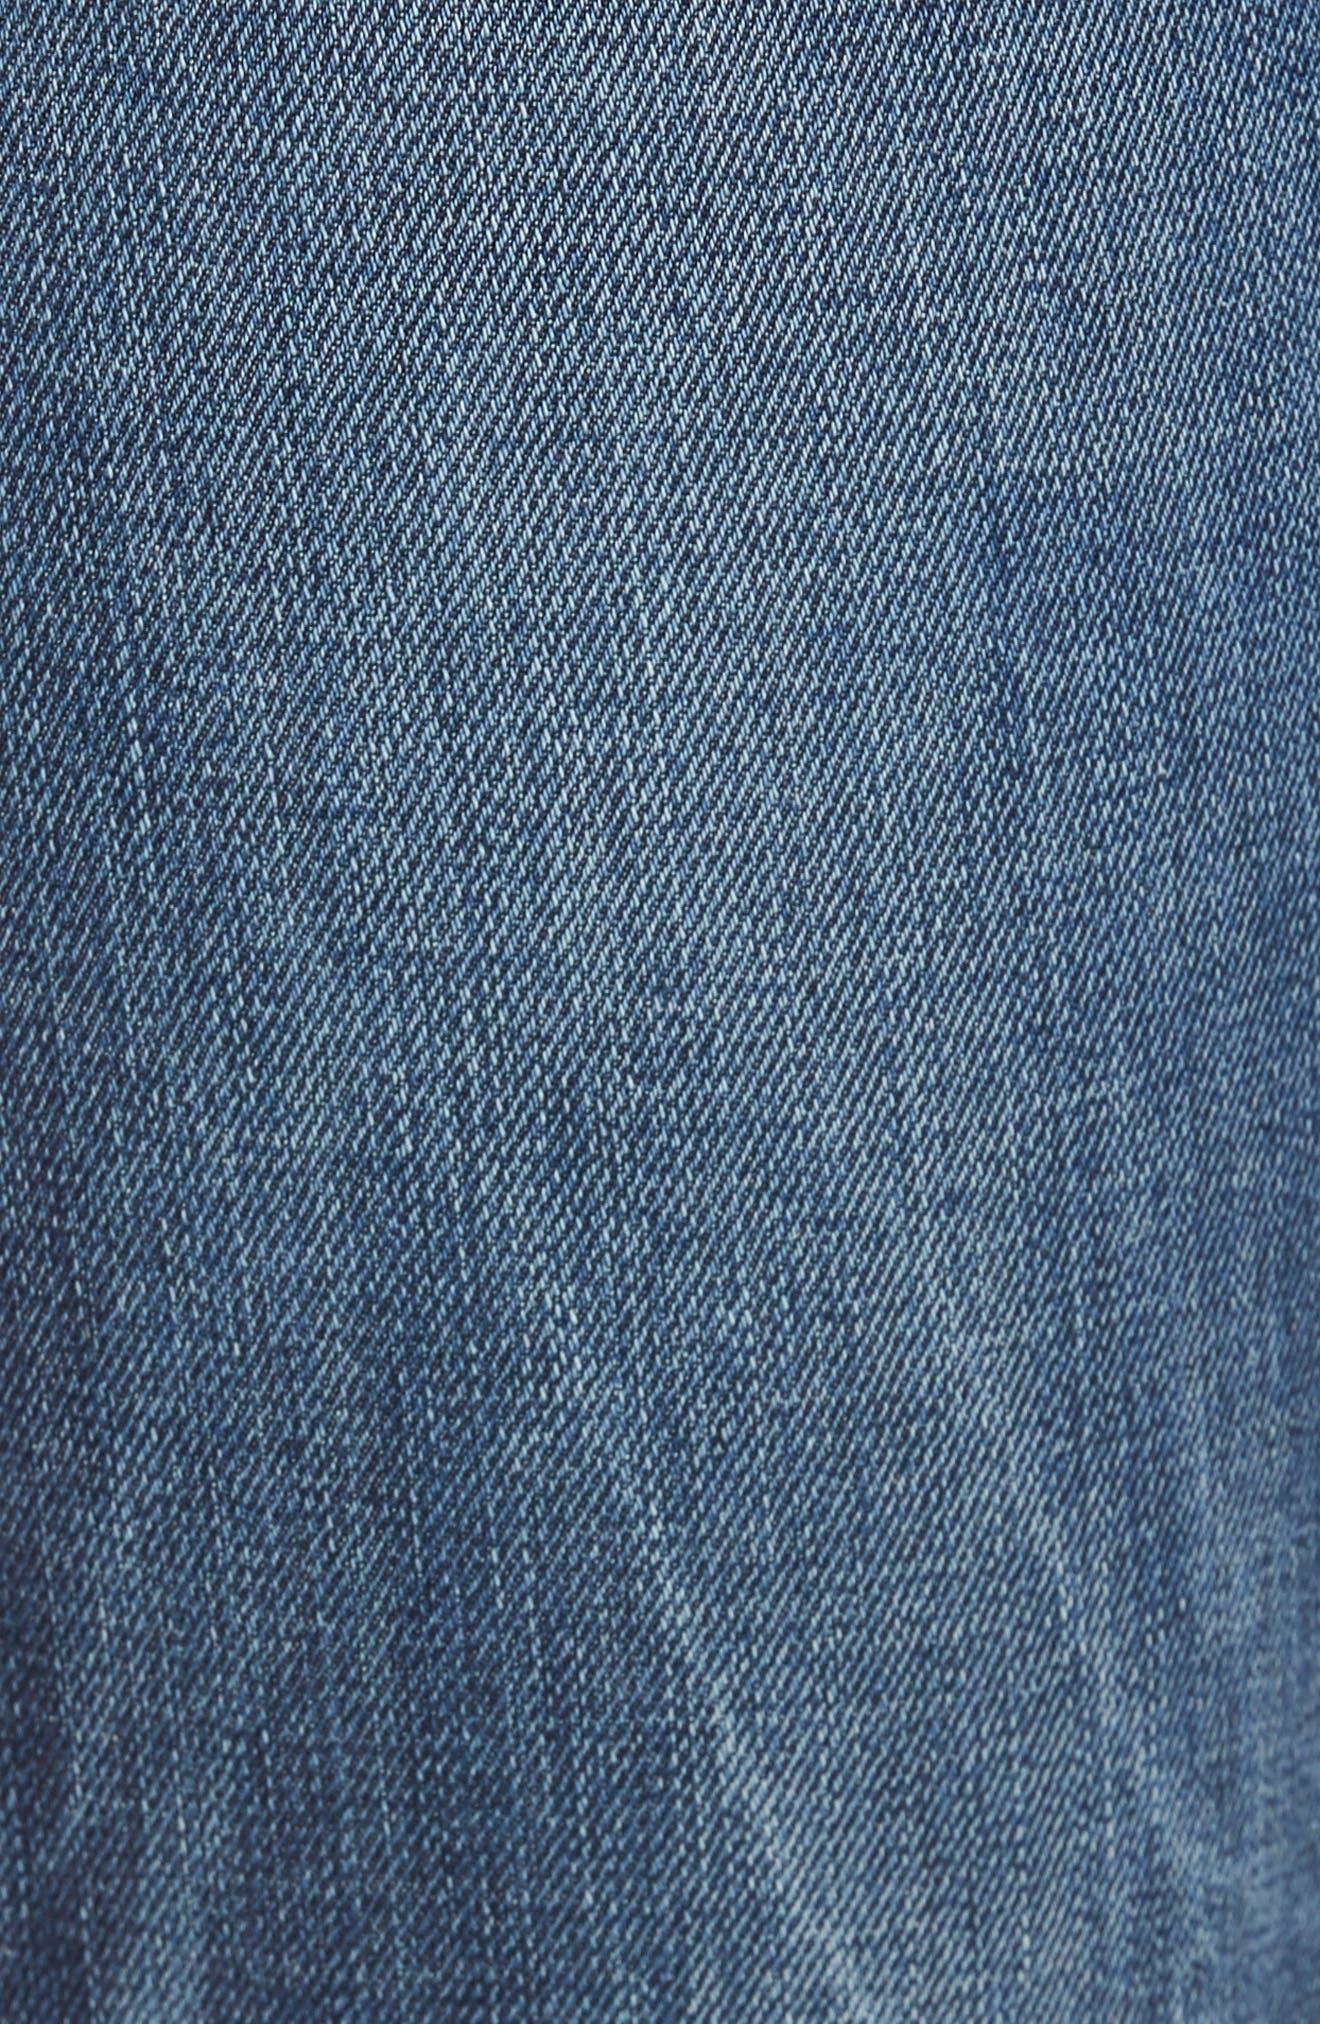 GOOD AMERICAN, High Waist Denim Bermuda Shorts, Alternate thumbnail 5, color, 402